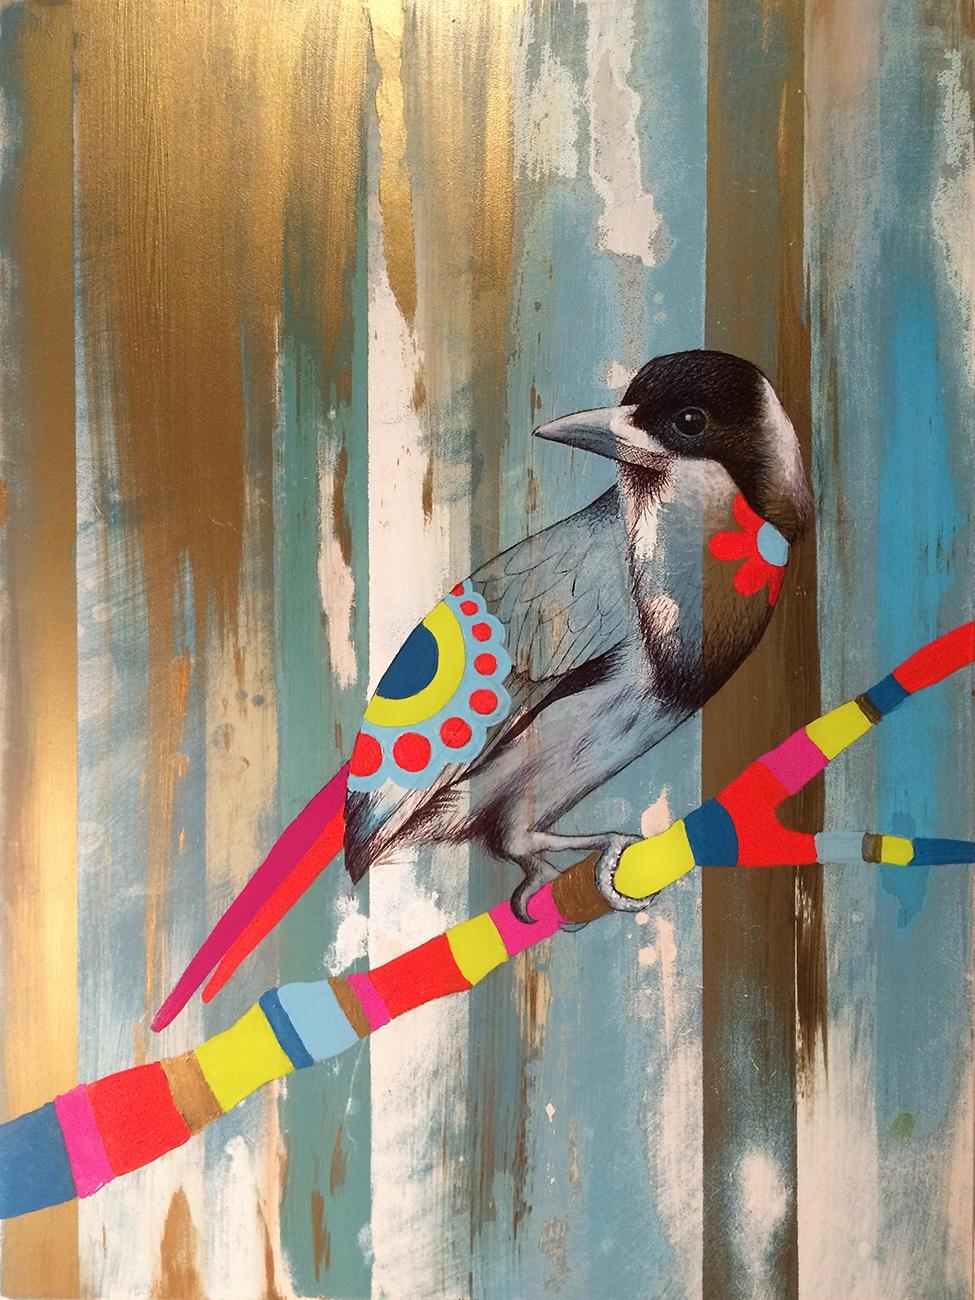 Bird Study #8 by Ramona Nordal